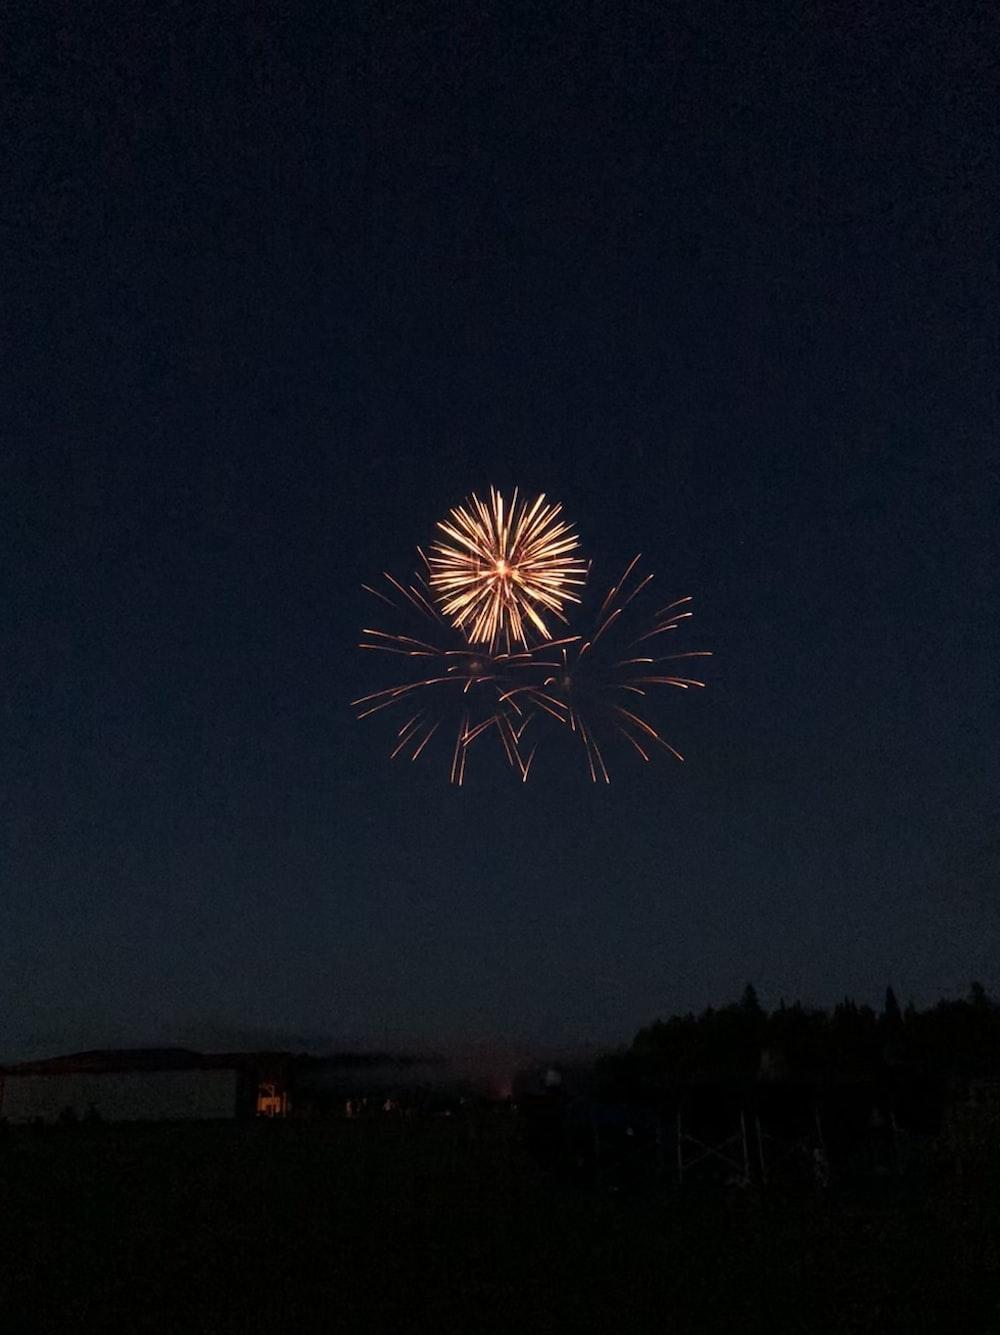 fireworks during nighttime